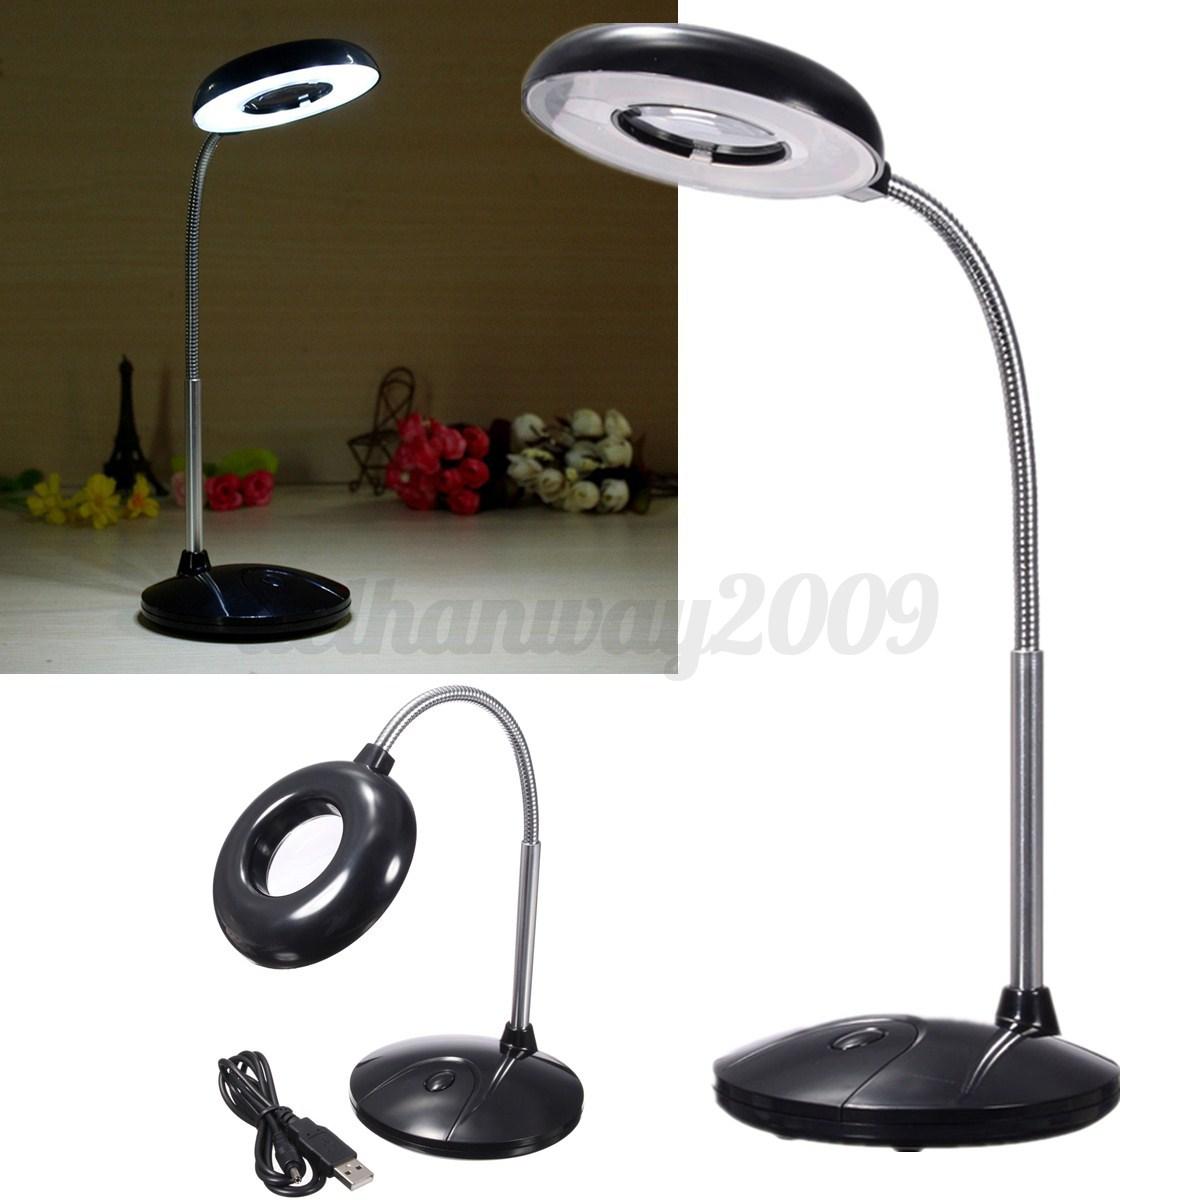 18 led usb battery power reading table desk study light lamp magnifying glass. Black Bedroom Furniture Sets. Home Design Ideas